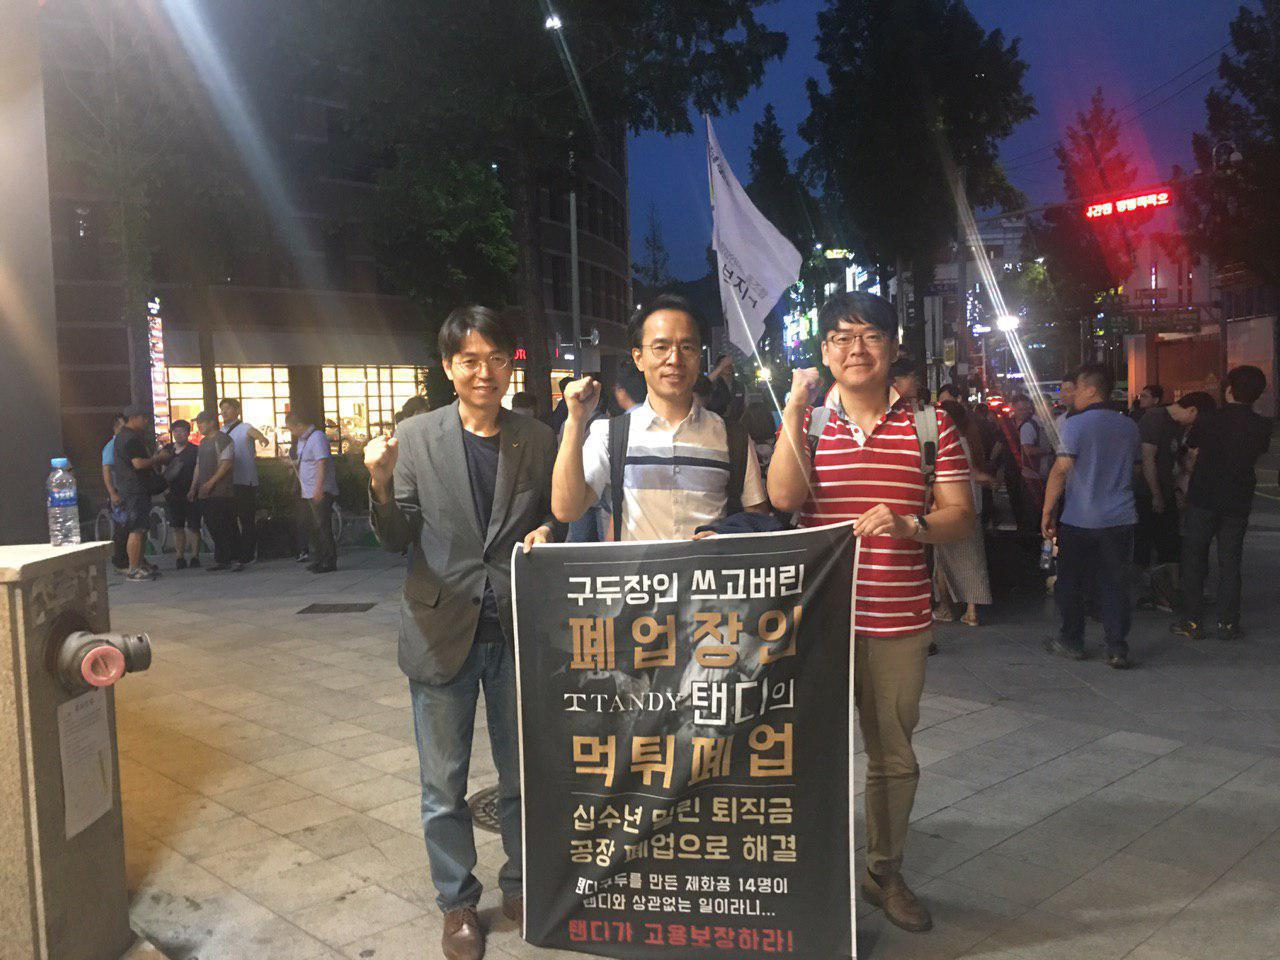 photo_2019-07-10_20-32-45.jpg